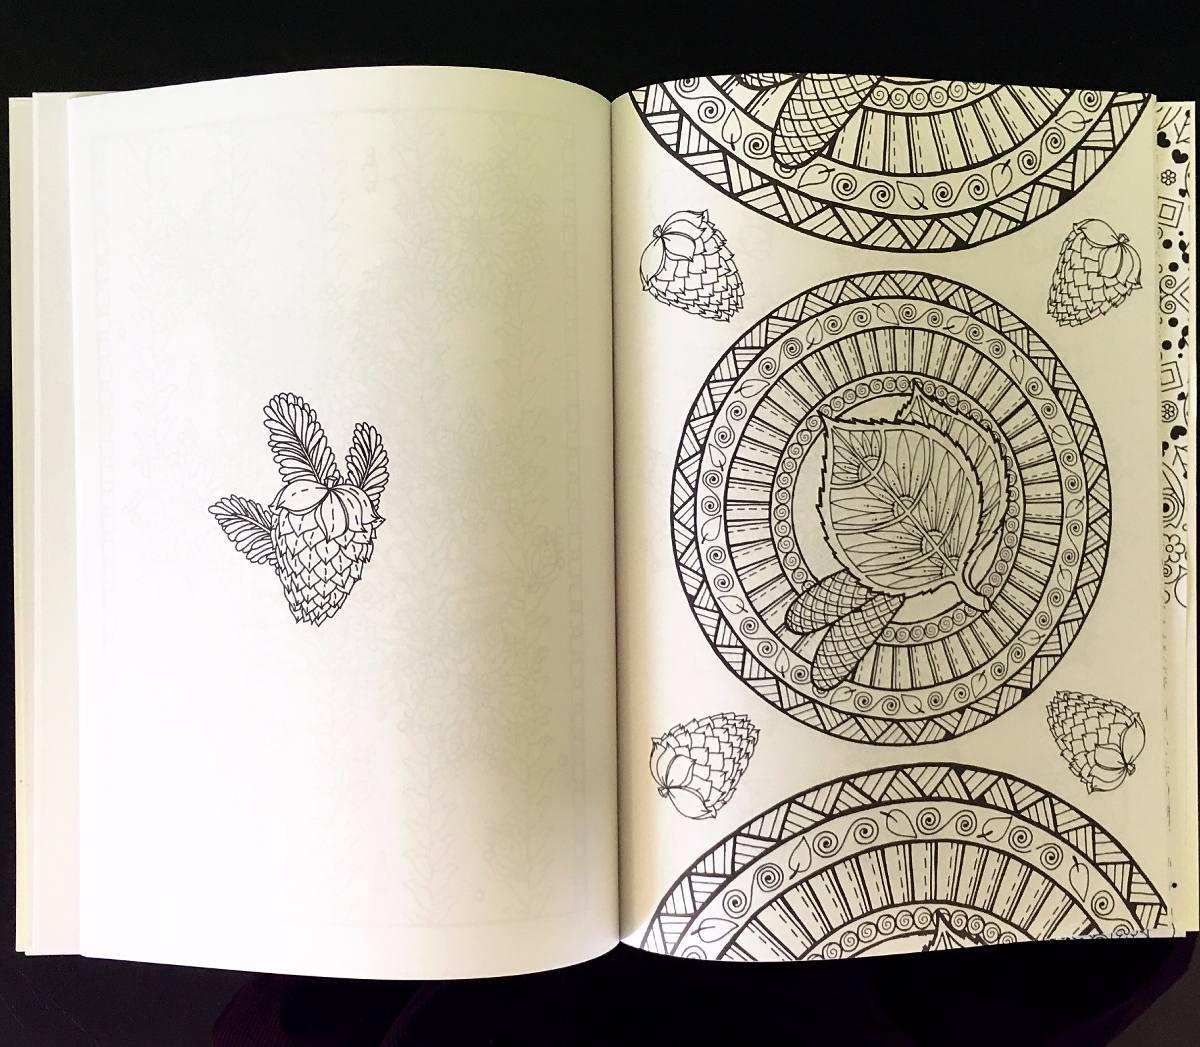 Libro Para Colorear Mandalas Para Niños - $ 134.00 en Mercado Libre